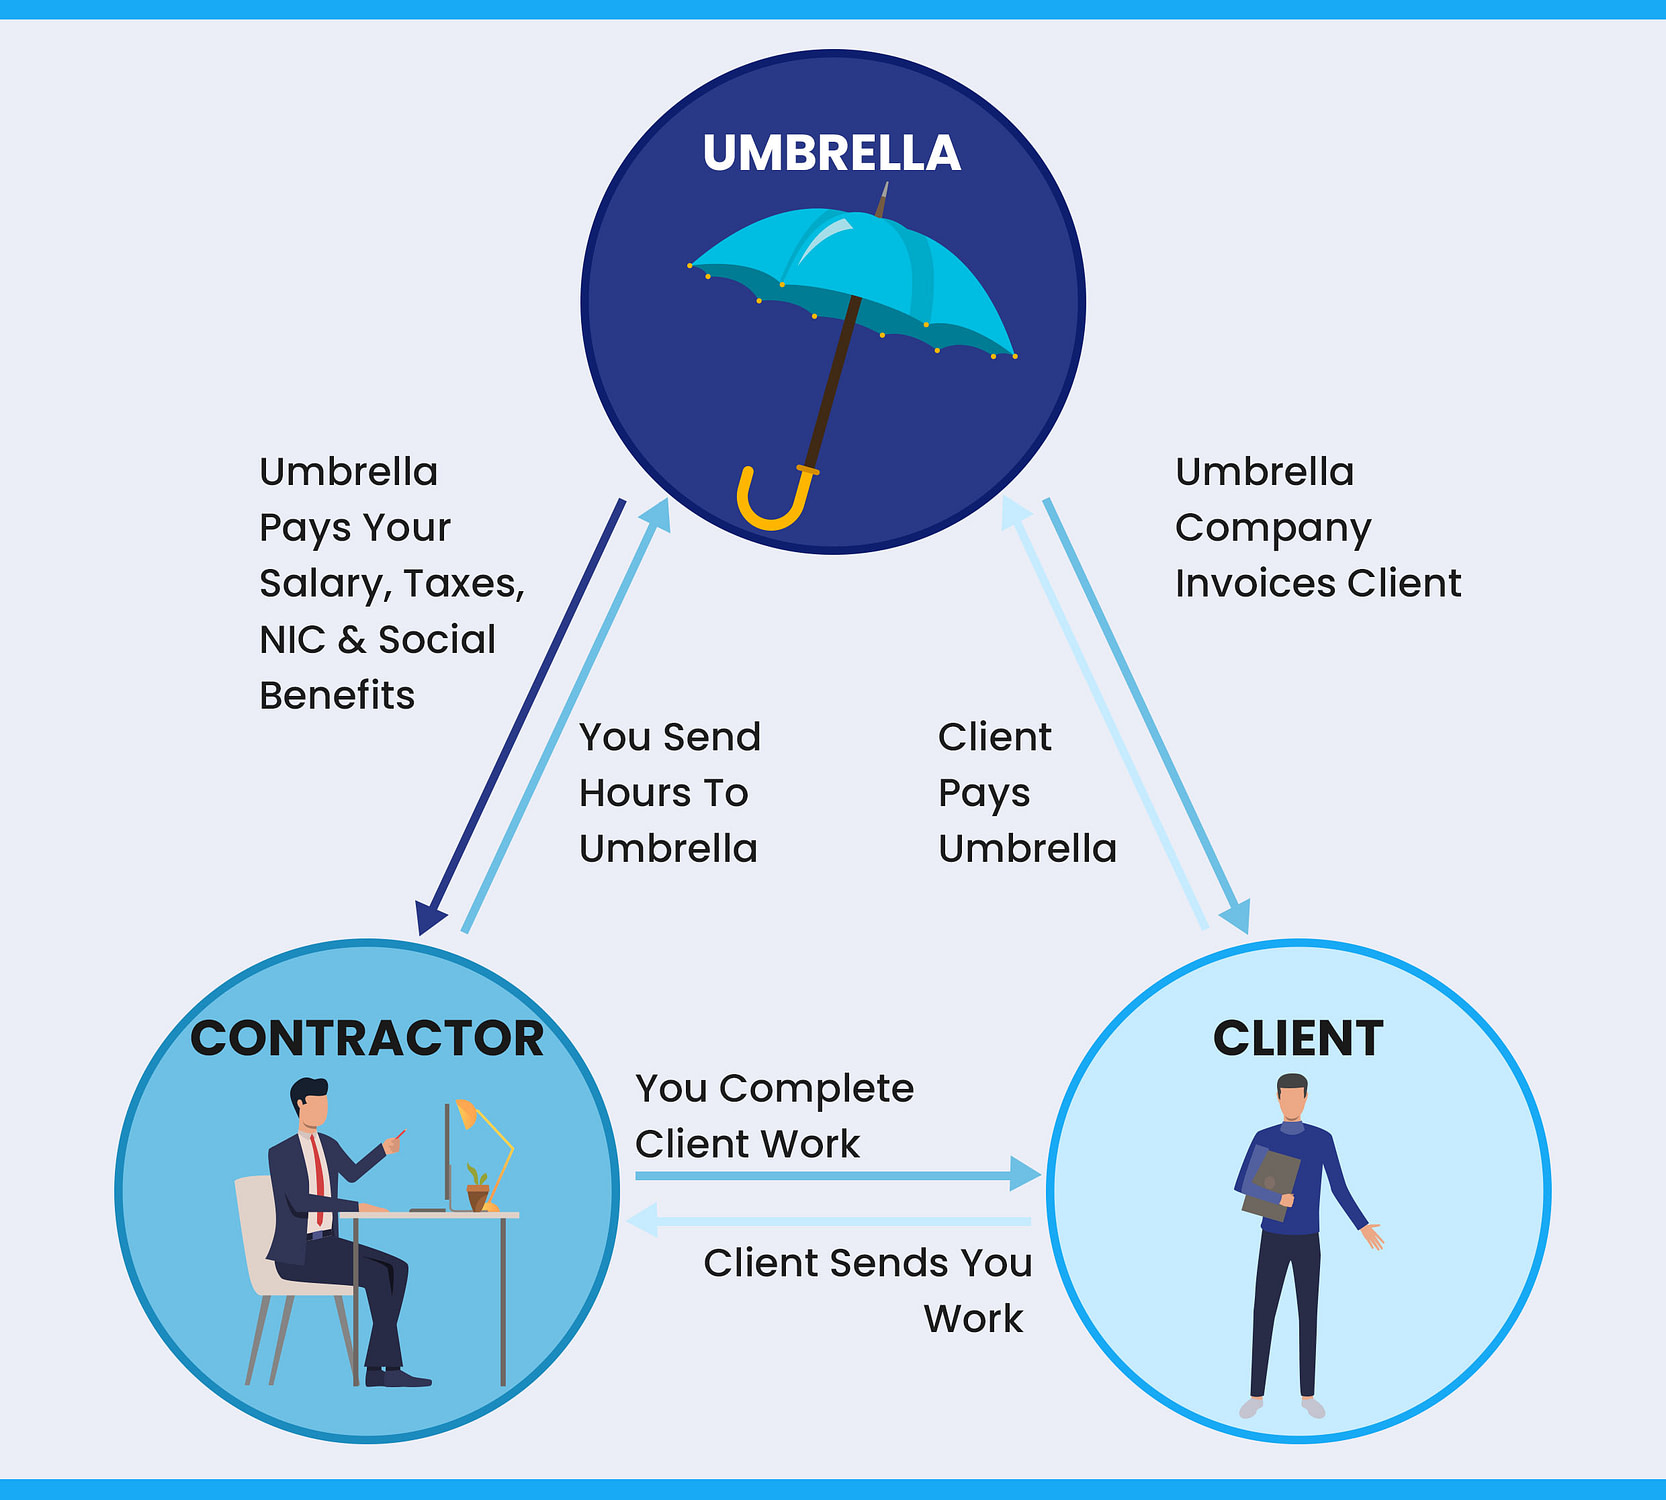 Umbrella Company - How does it work